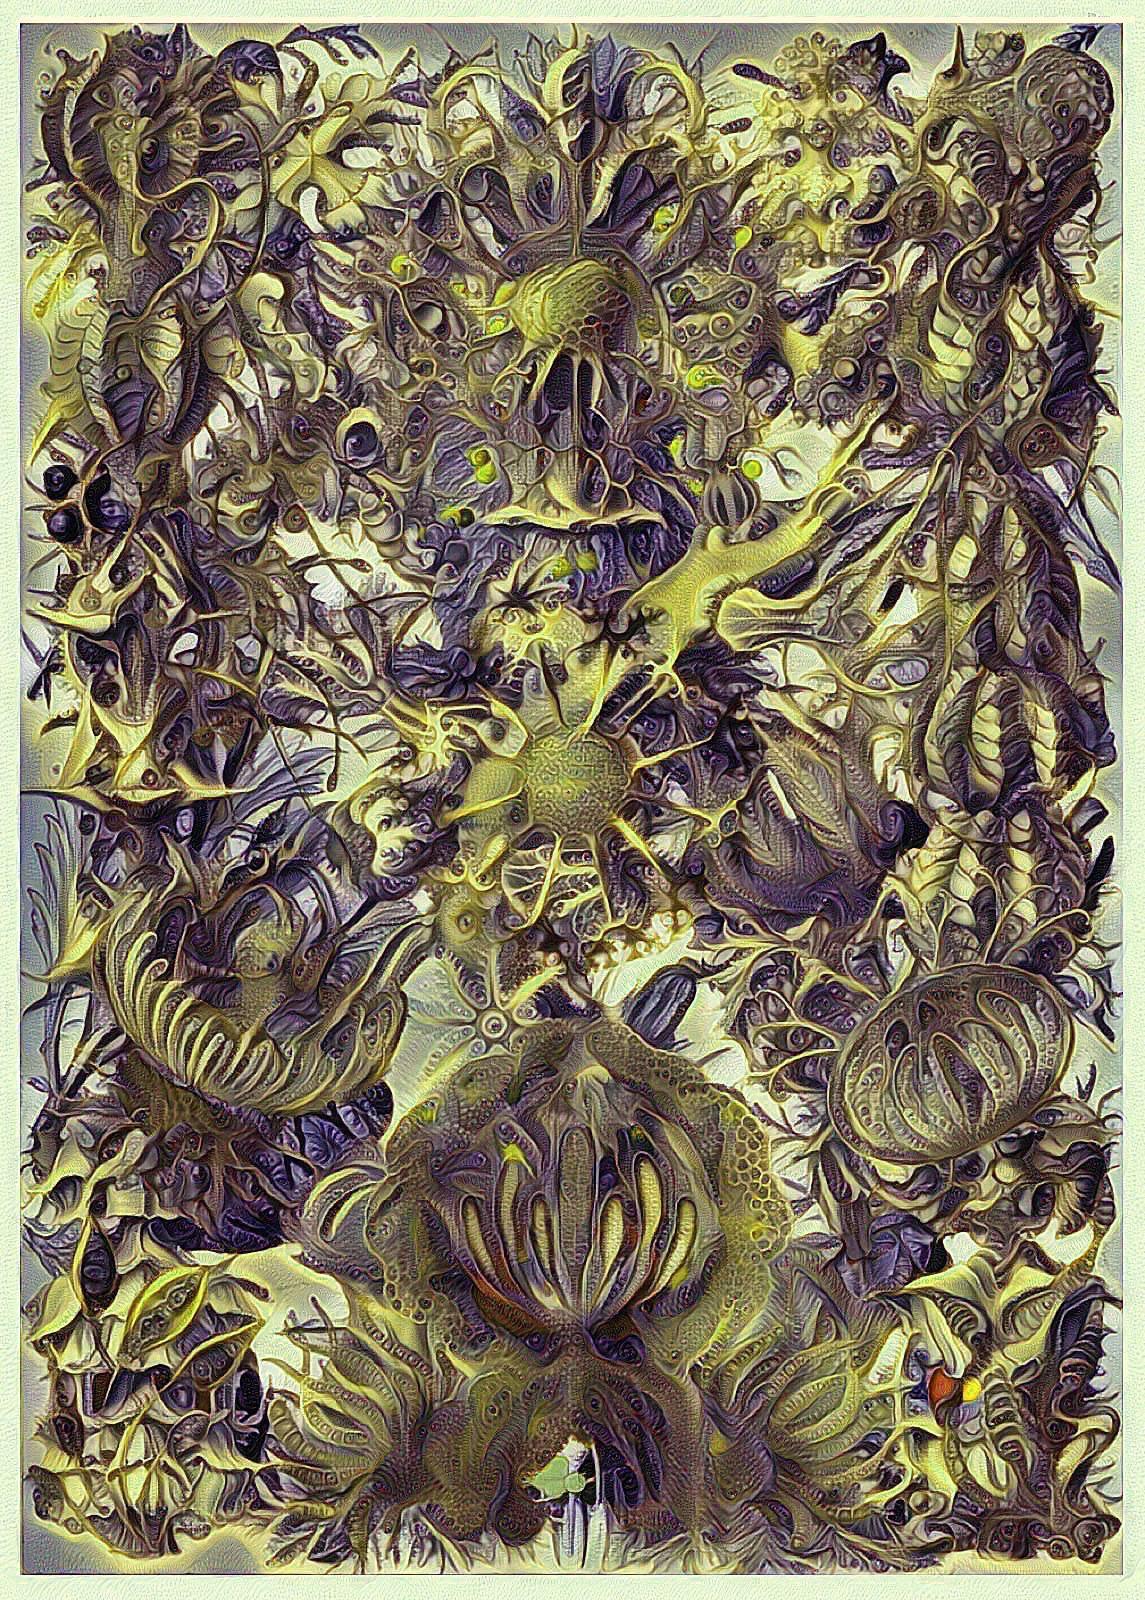 Haeckel Variation 17 by james119